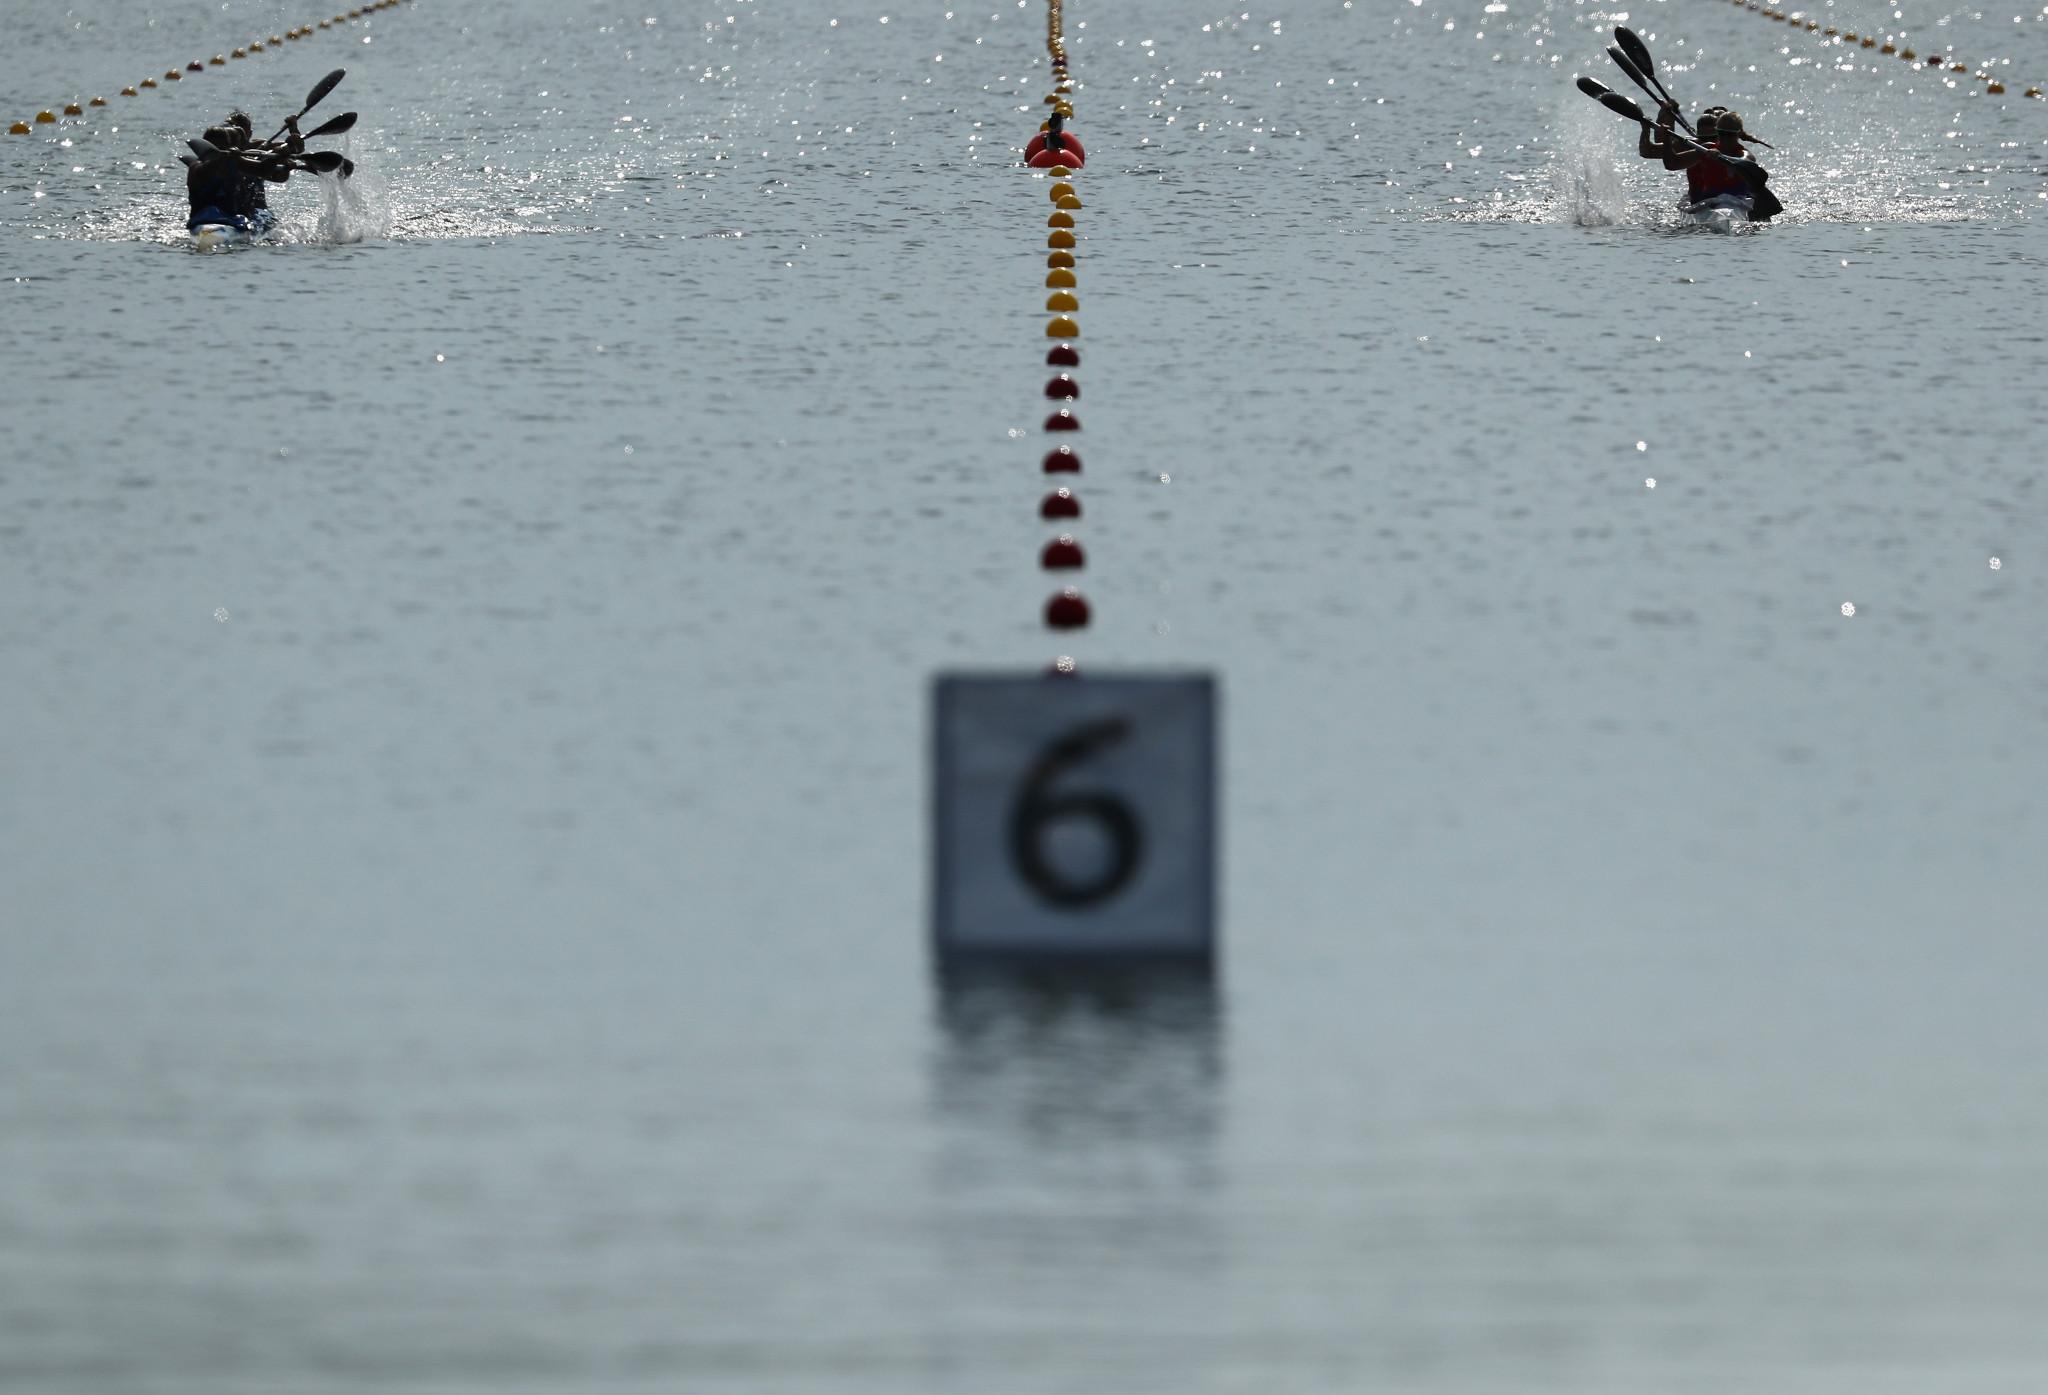 European Olympic canoe sprint qualifier underway in Szeged